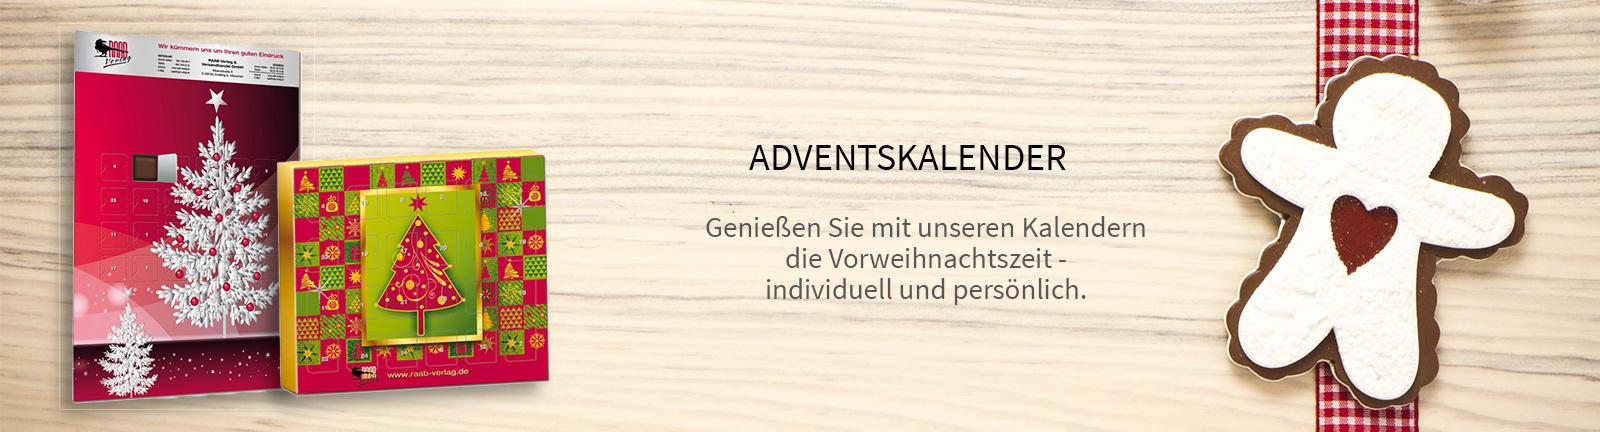 Schoko-Adventskalender